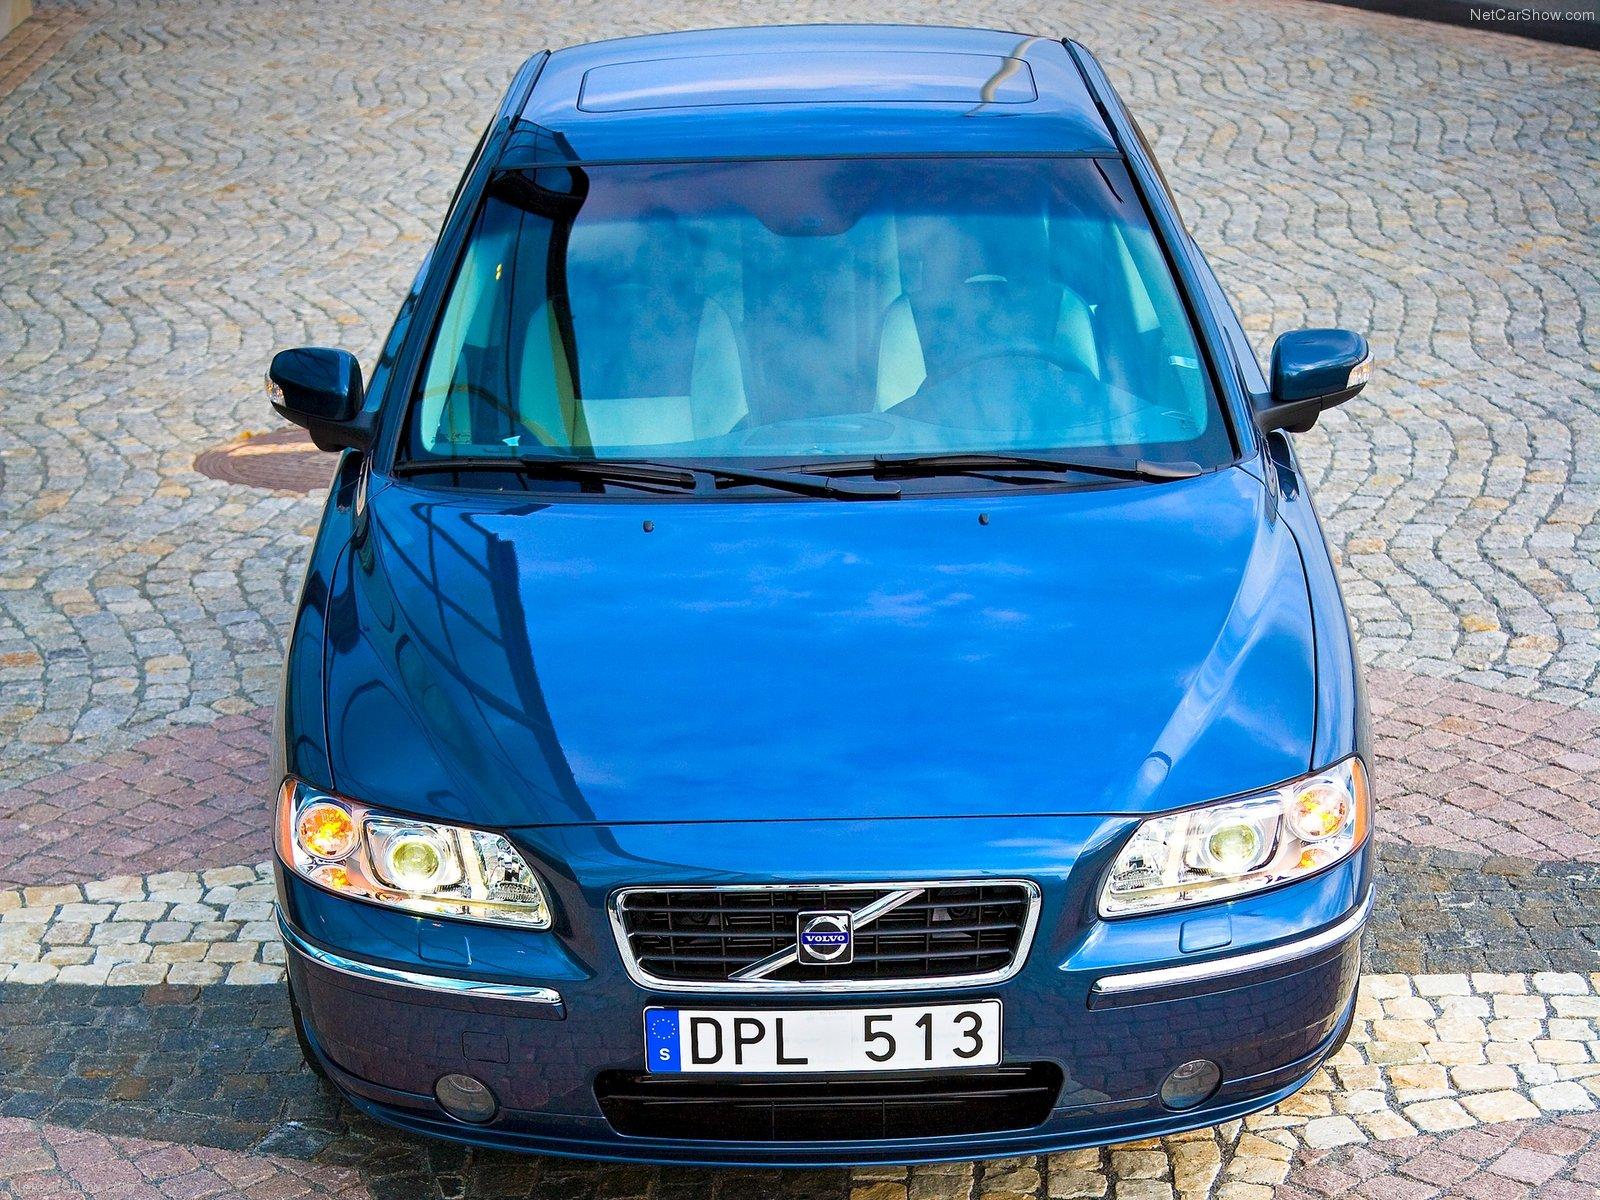 Volvo S60 2007 Volvo-S60-2007-1600-1f